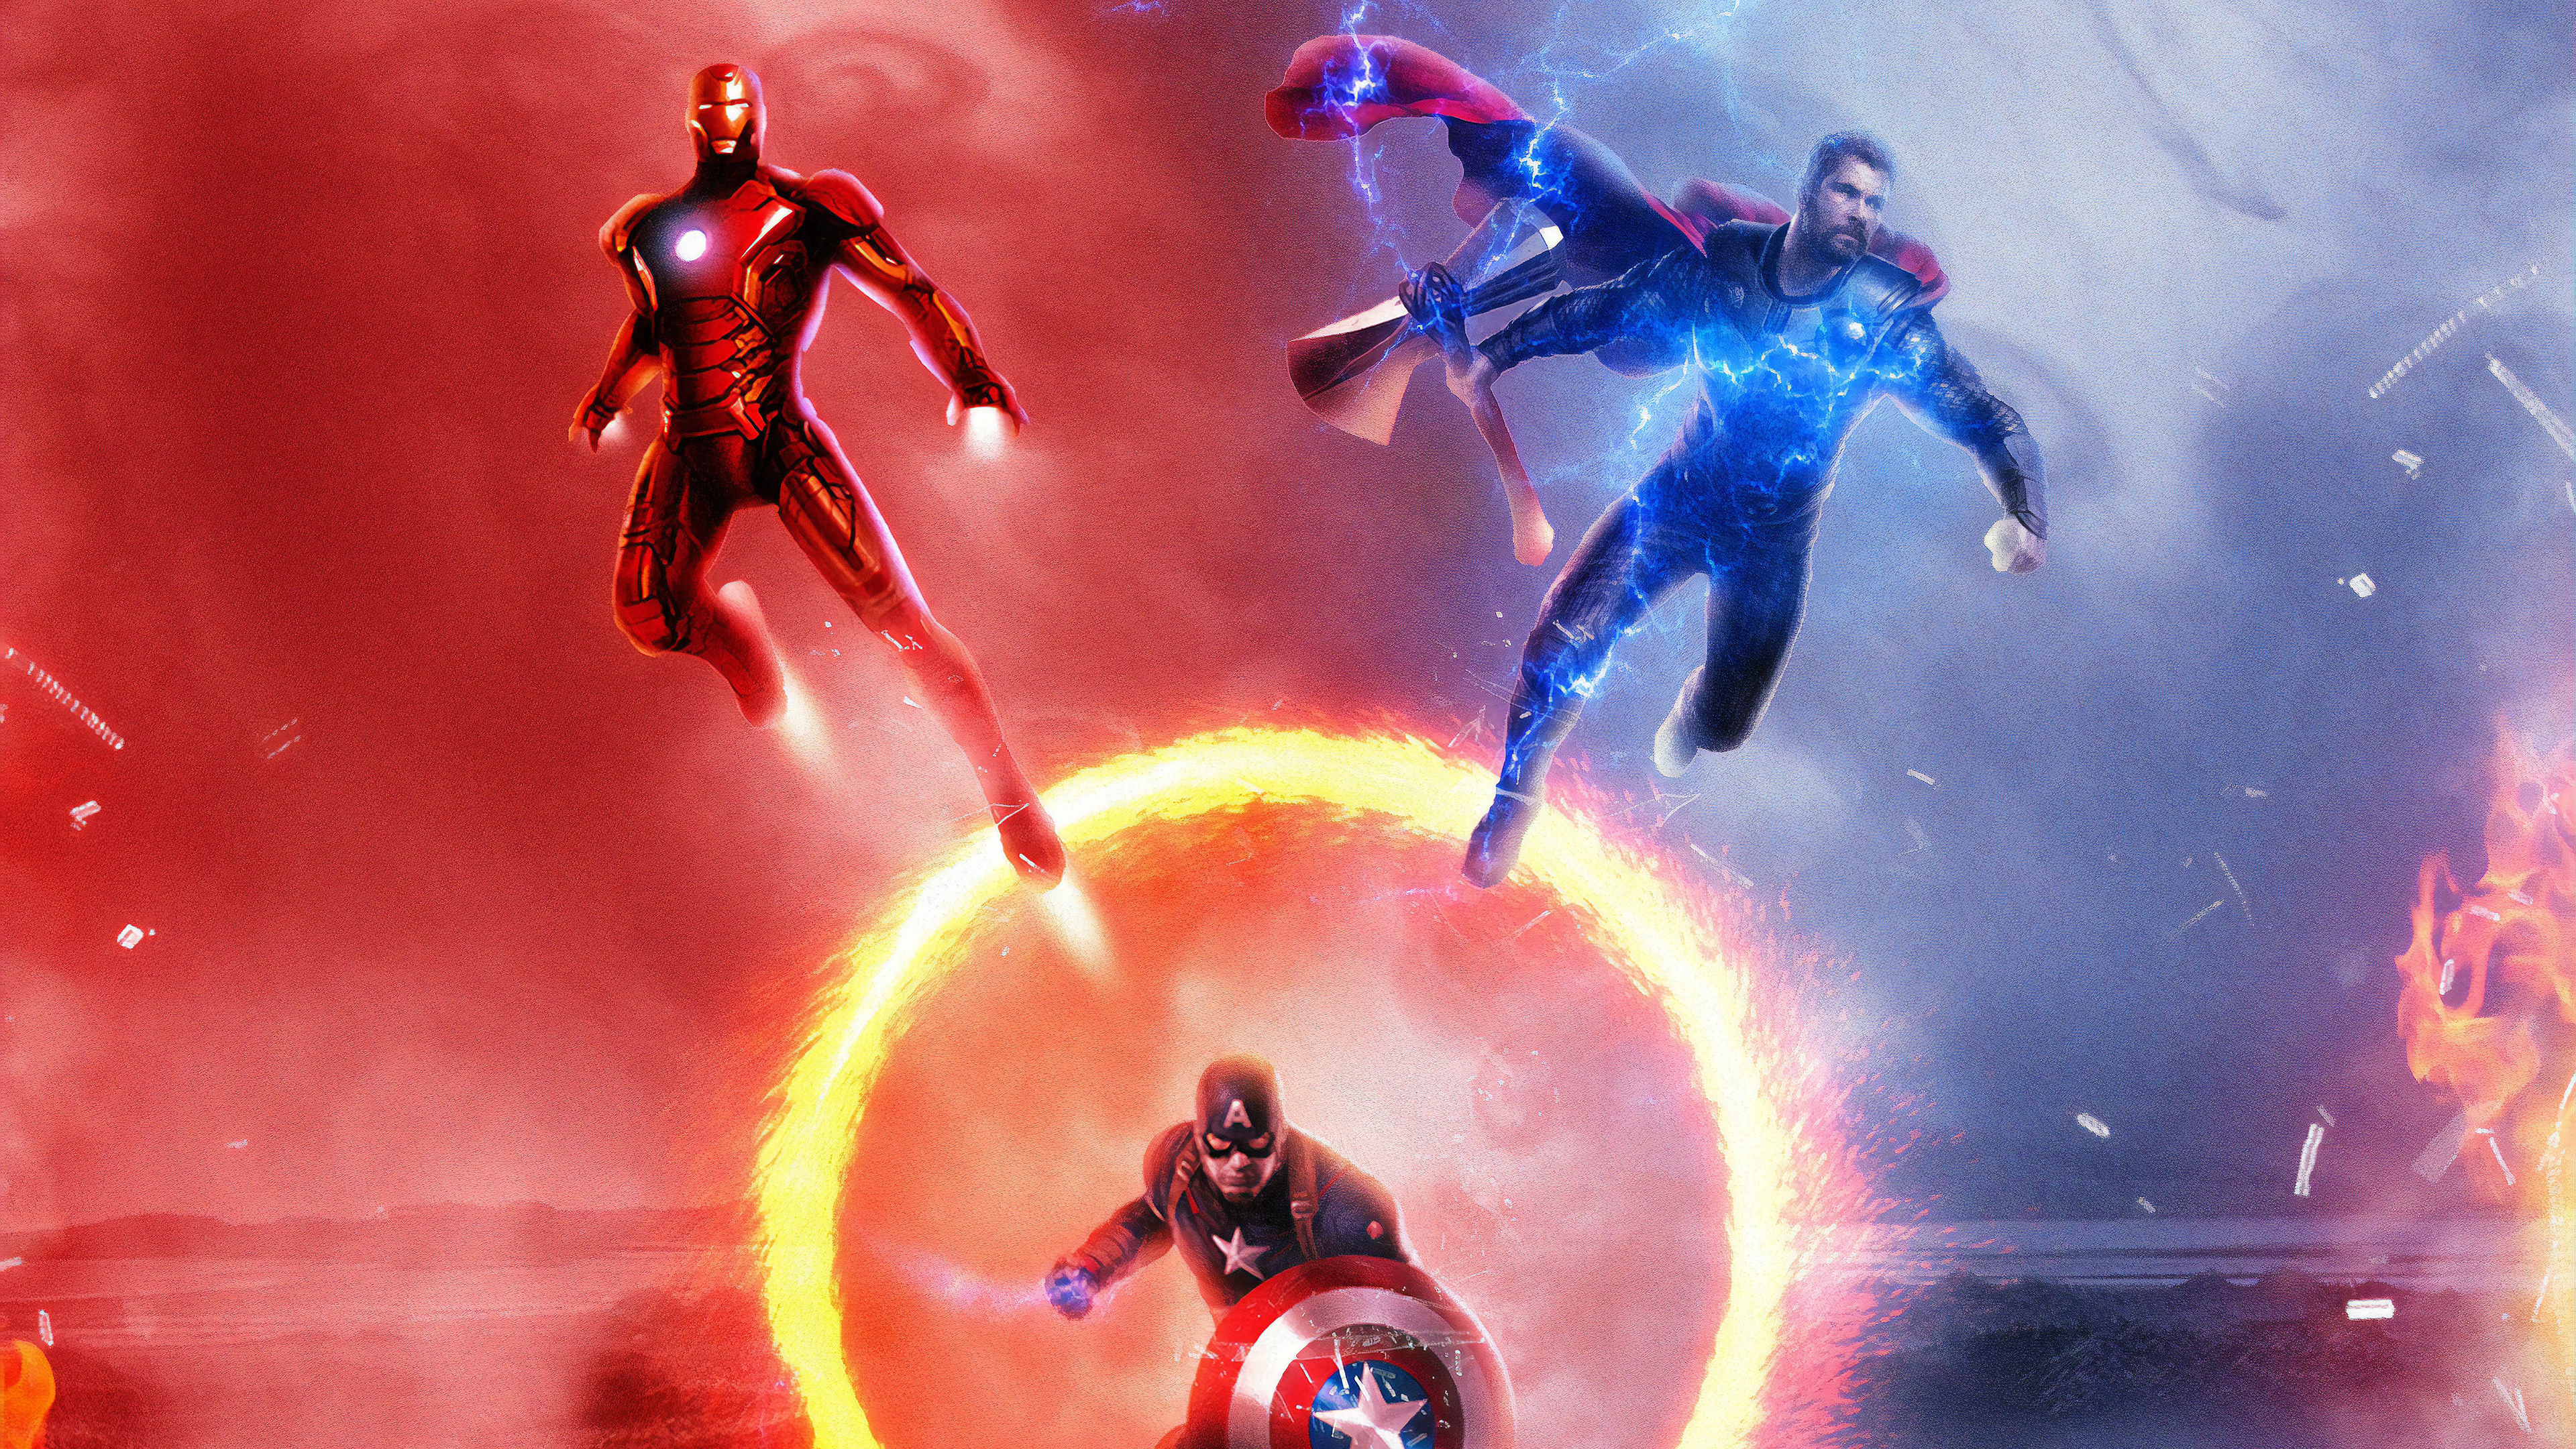 Avengers Endgame Trinity 4k, HD Superheroes, 4k Wallpapers ...